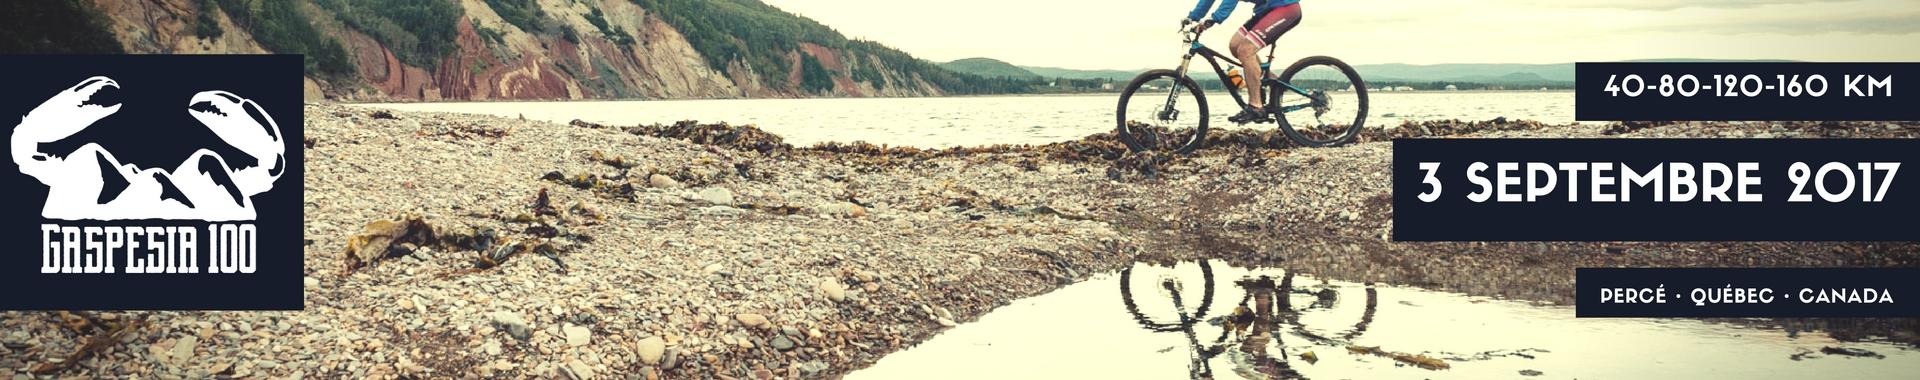 Raid Gaspesia 100, vélo de montagne, mtb marathon, Percé, Gaspésie